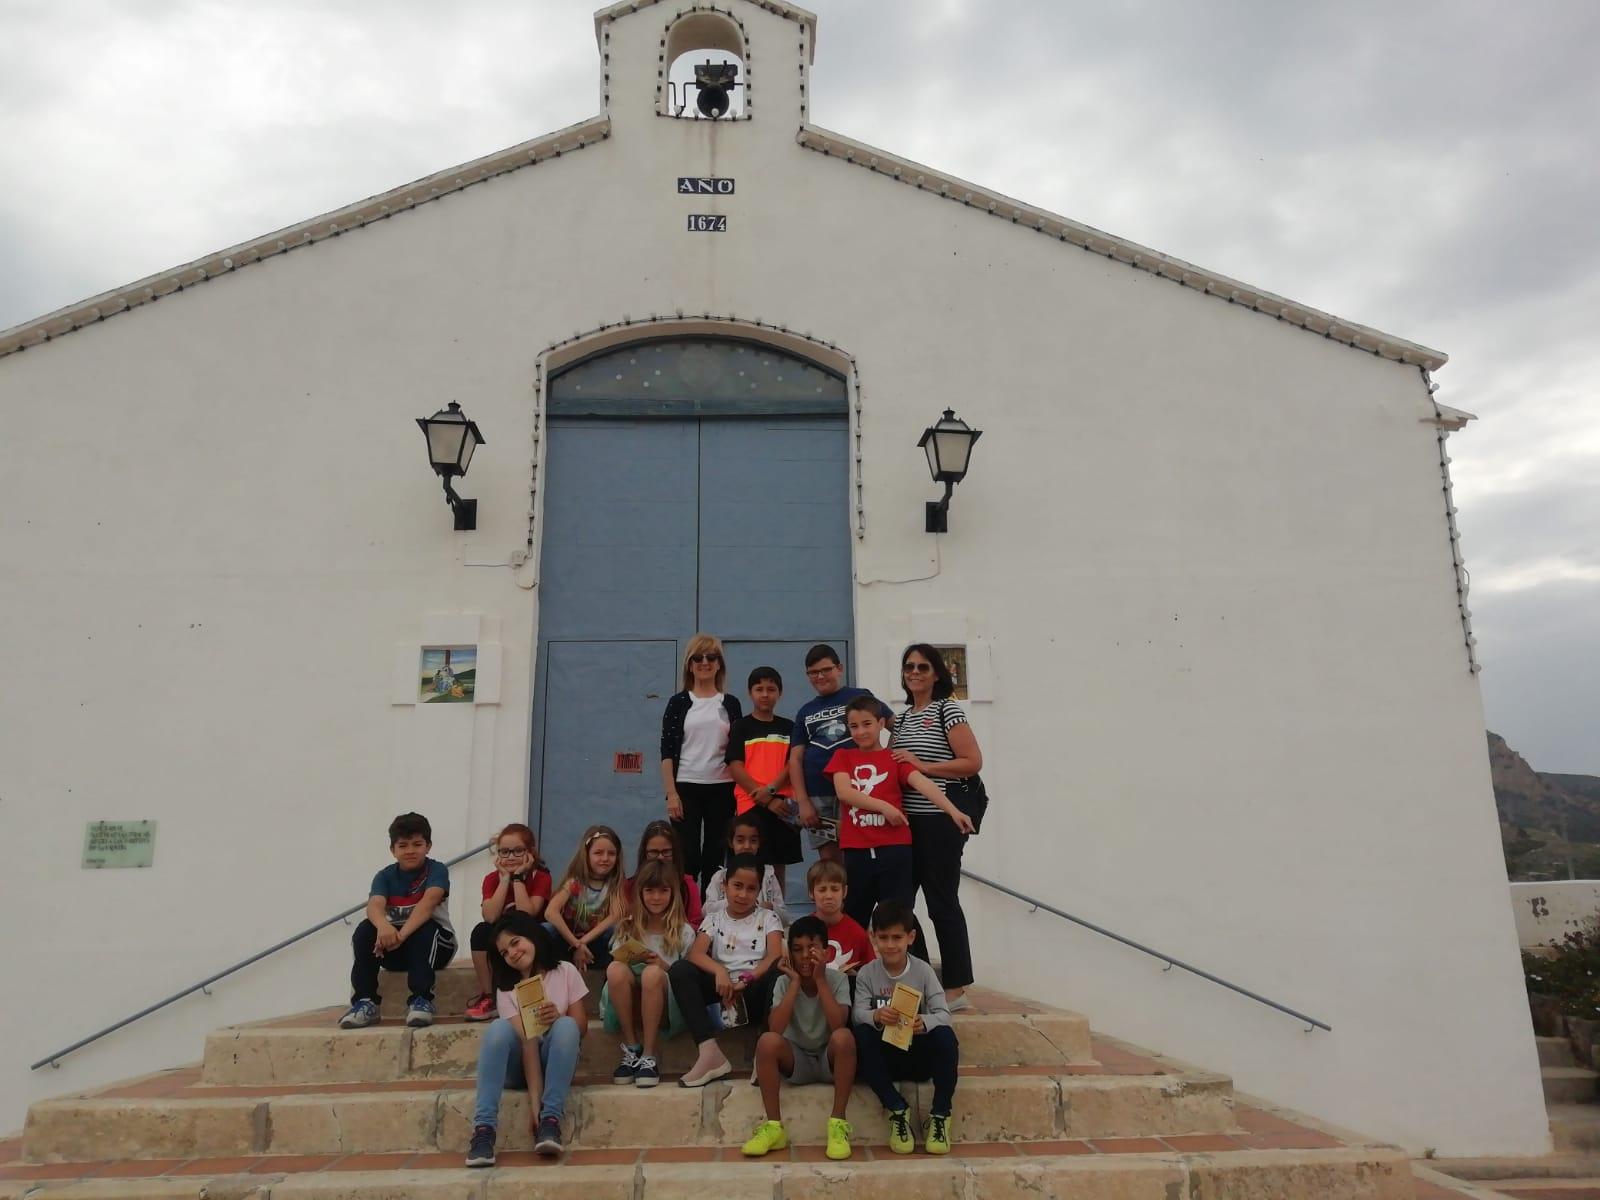 (2019-05-24) Visita ermita alumnos Laura - 3 A primaria - Reina Sofia - María Isabel Berenguer (01)